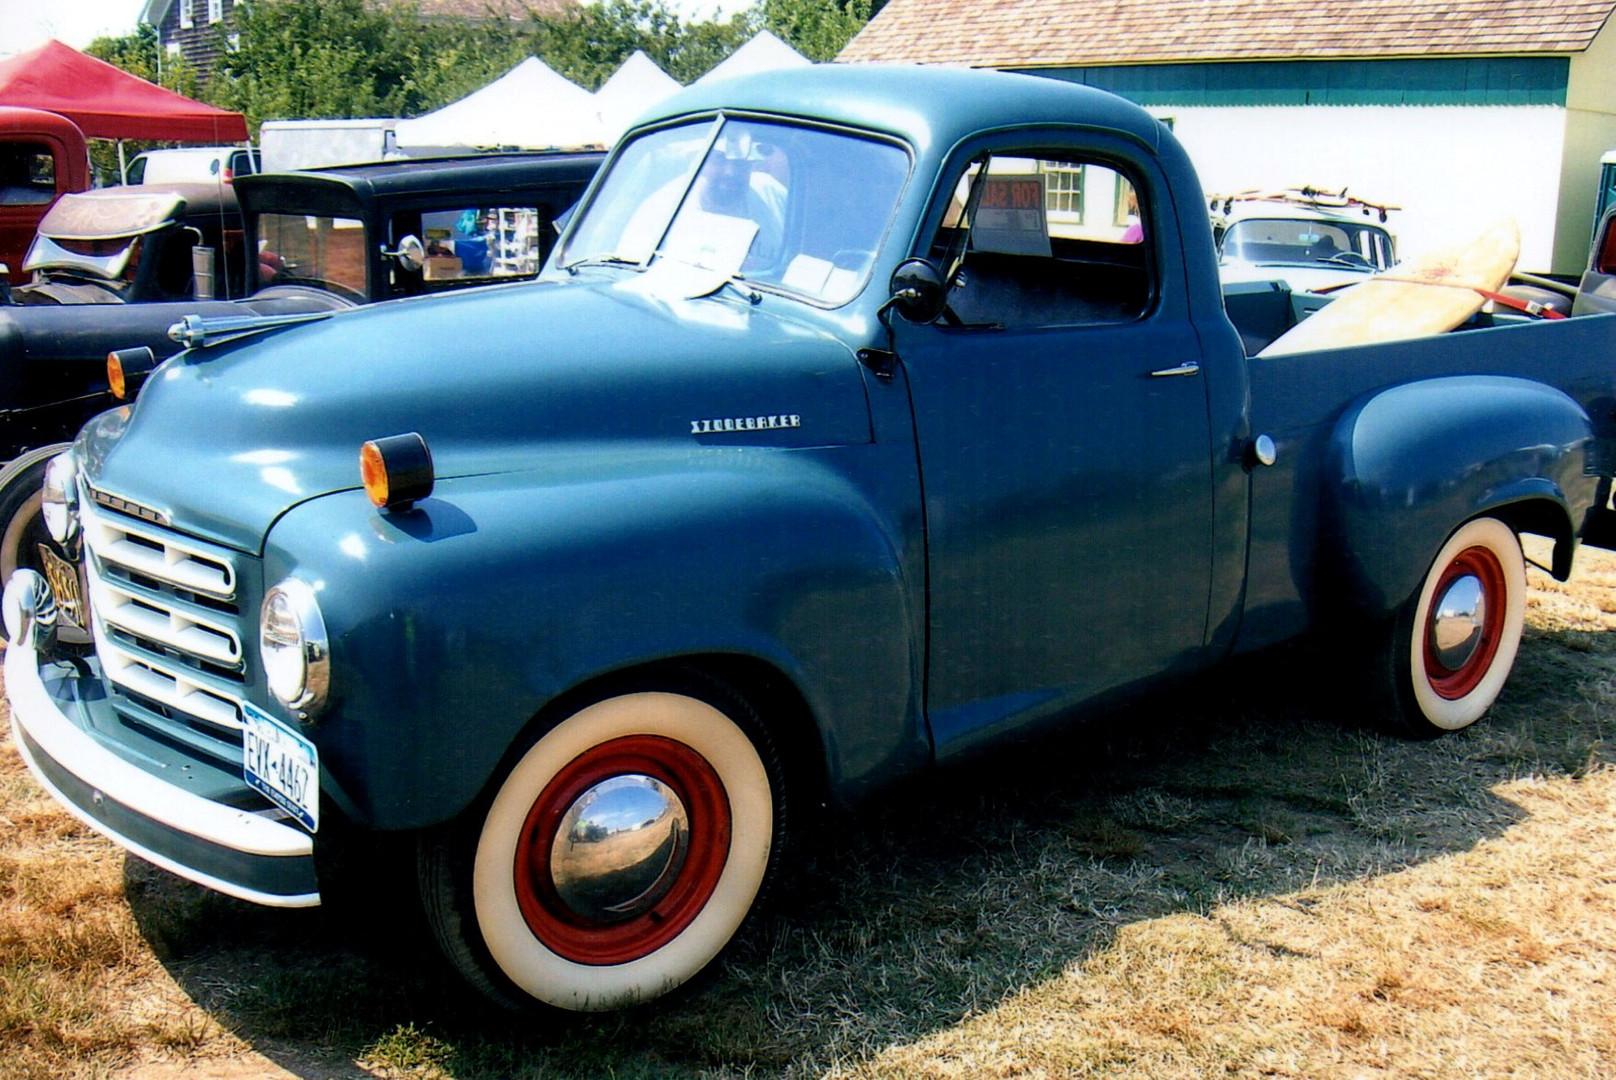 1950 Studebaker 2RS pickup